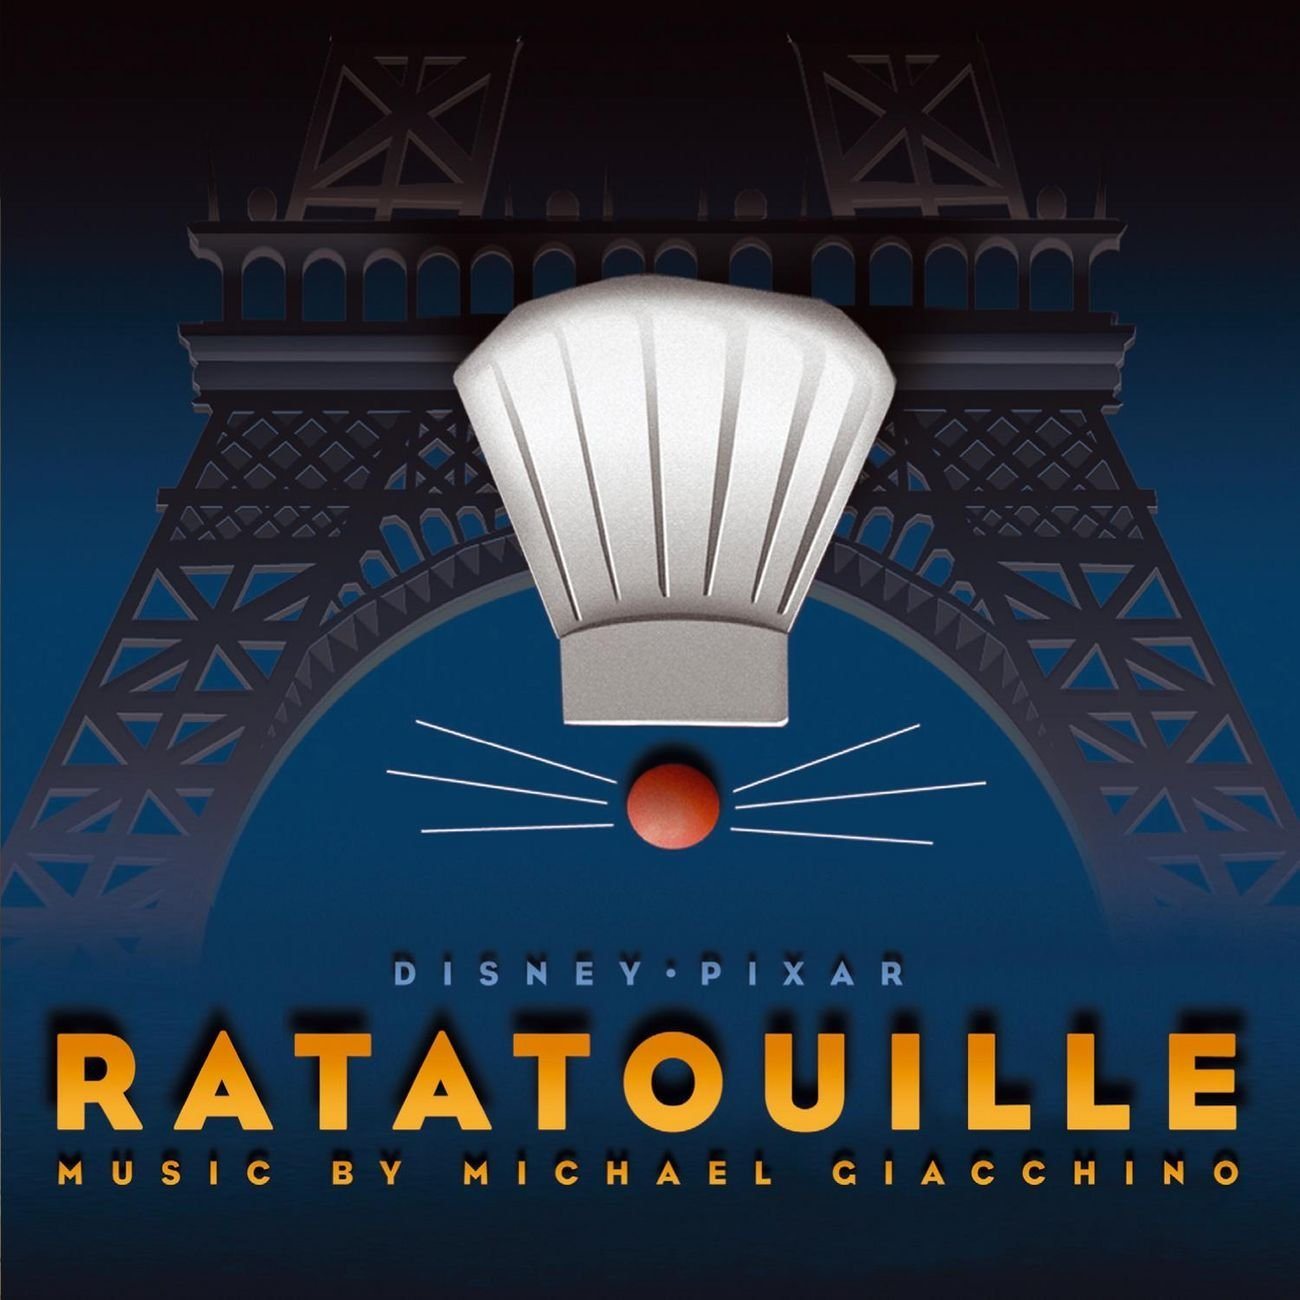 Pixar disney bande originale soundtrack ratatouille